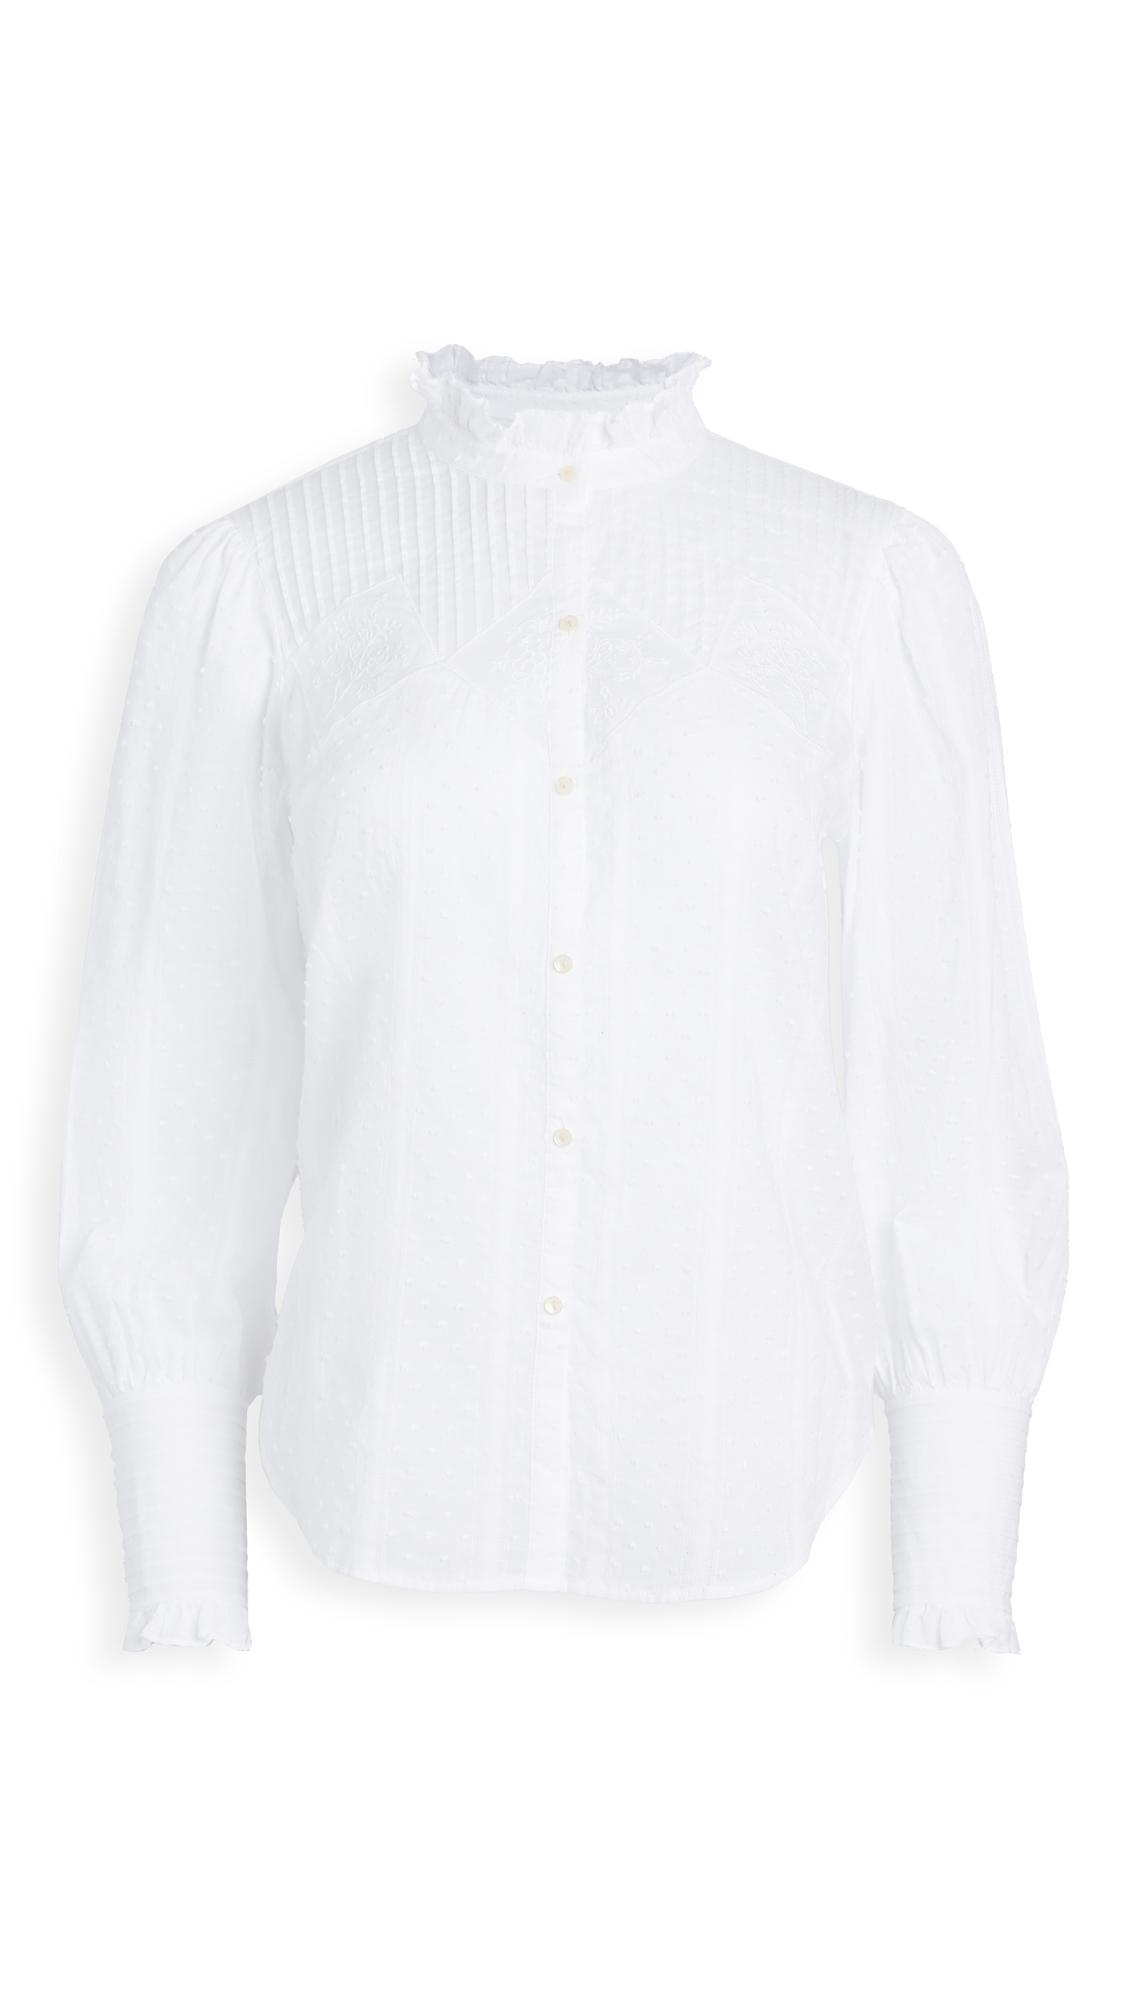 La Vie Rebecca Taylor Long Sleeve Kelsey Clip Top - 40% Off Sale